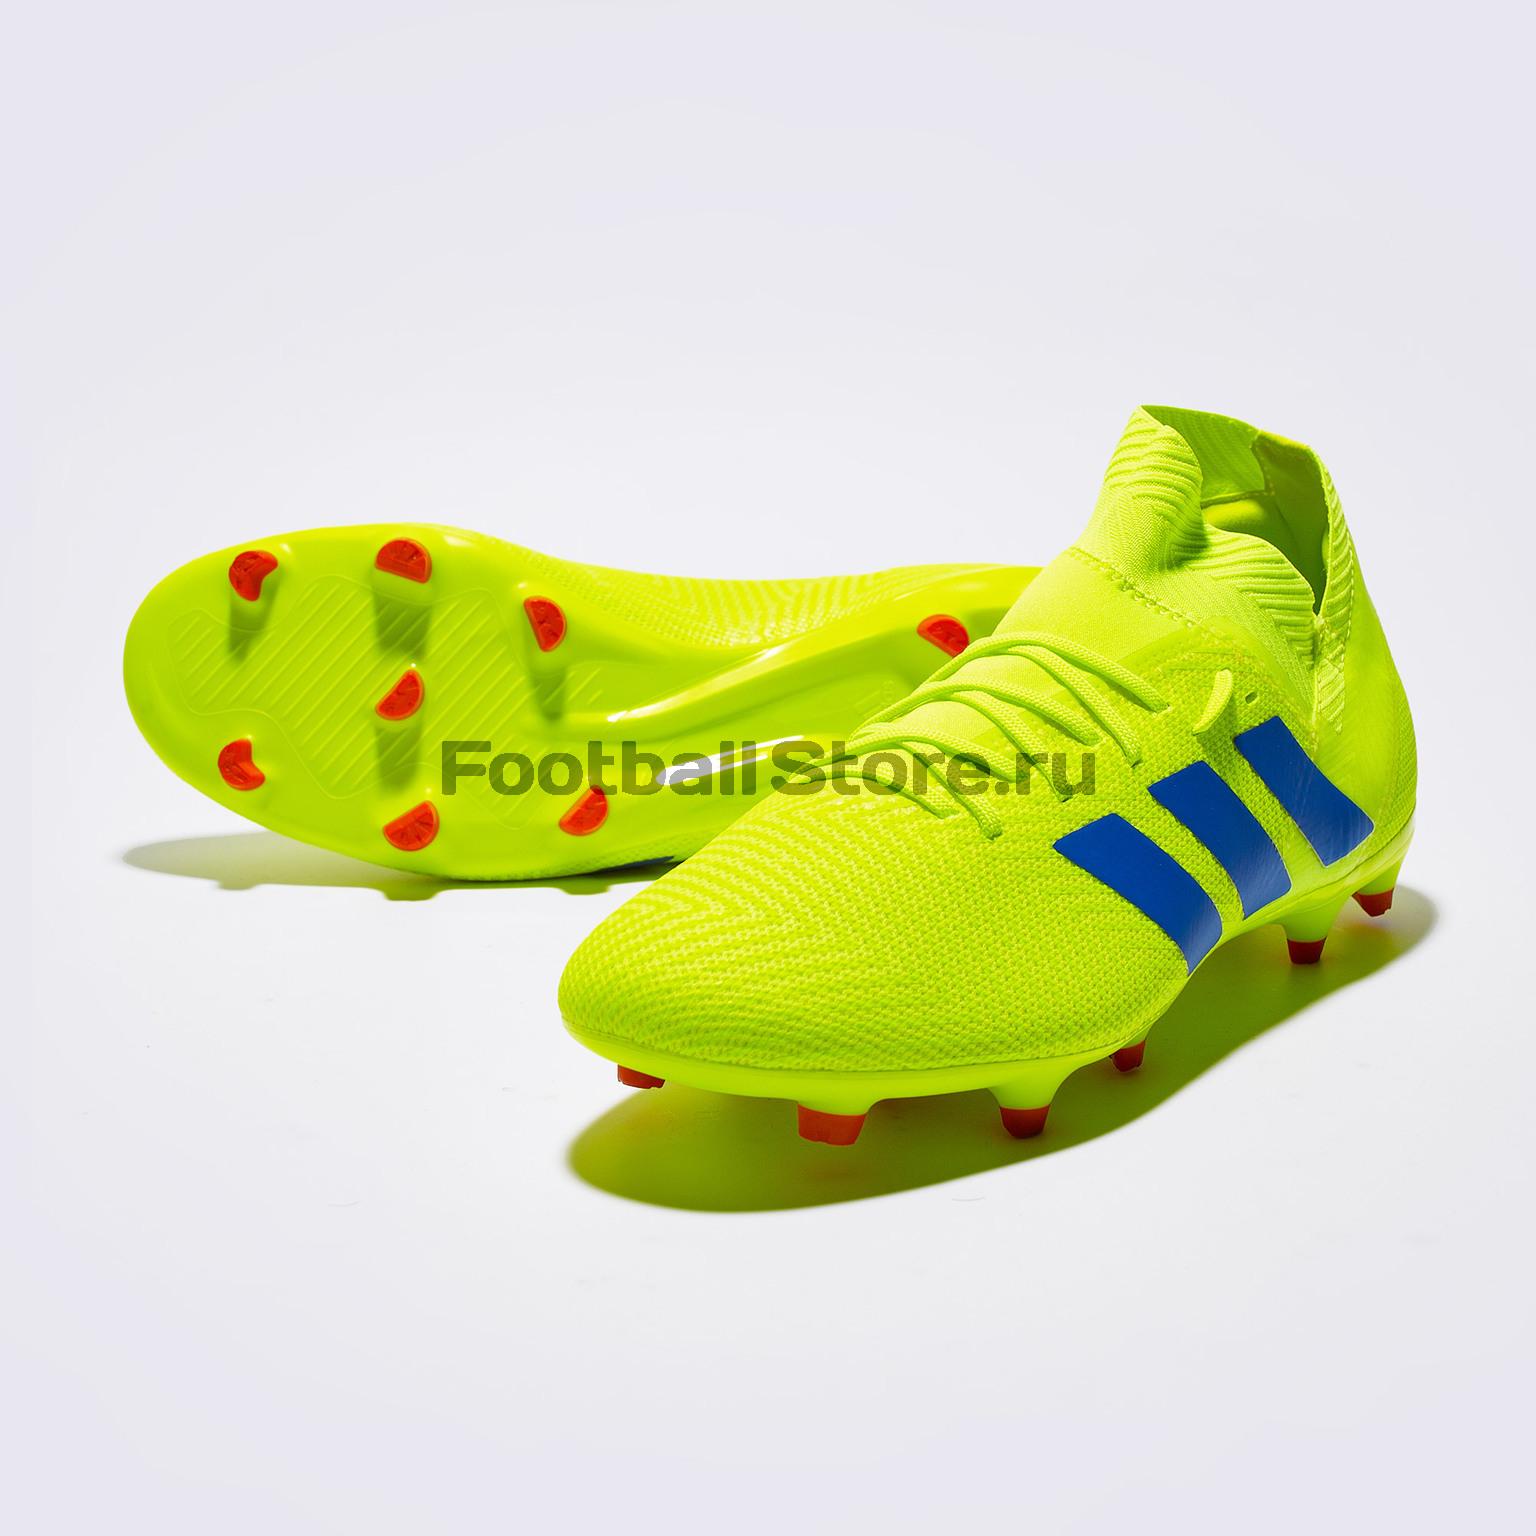 Бутсы Adidas Nemeziz 18.3 FG BB9438 бутсы adidas messi 16 1 fg jr bb3852